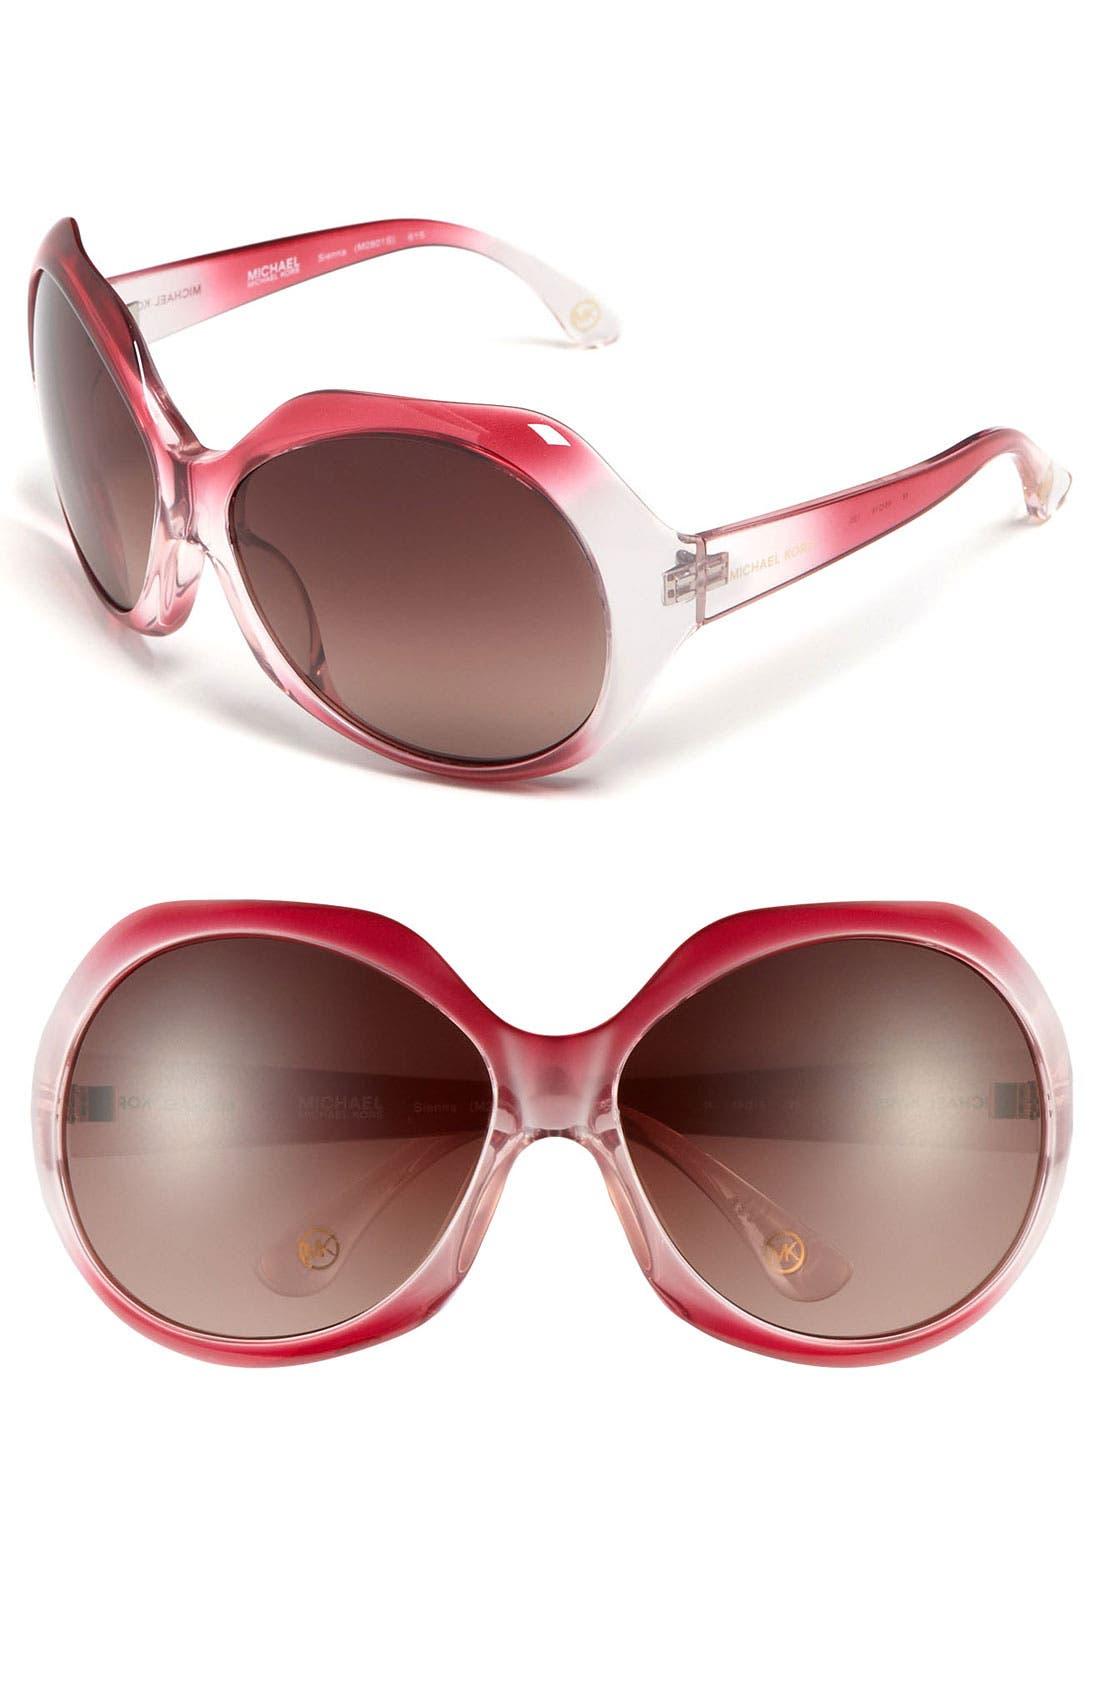 Alternate Image 1 Selected - MICHAEL Michael Kors 'Sienna' Oversized Sunglasses